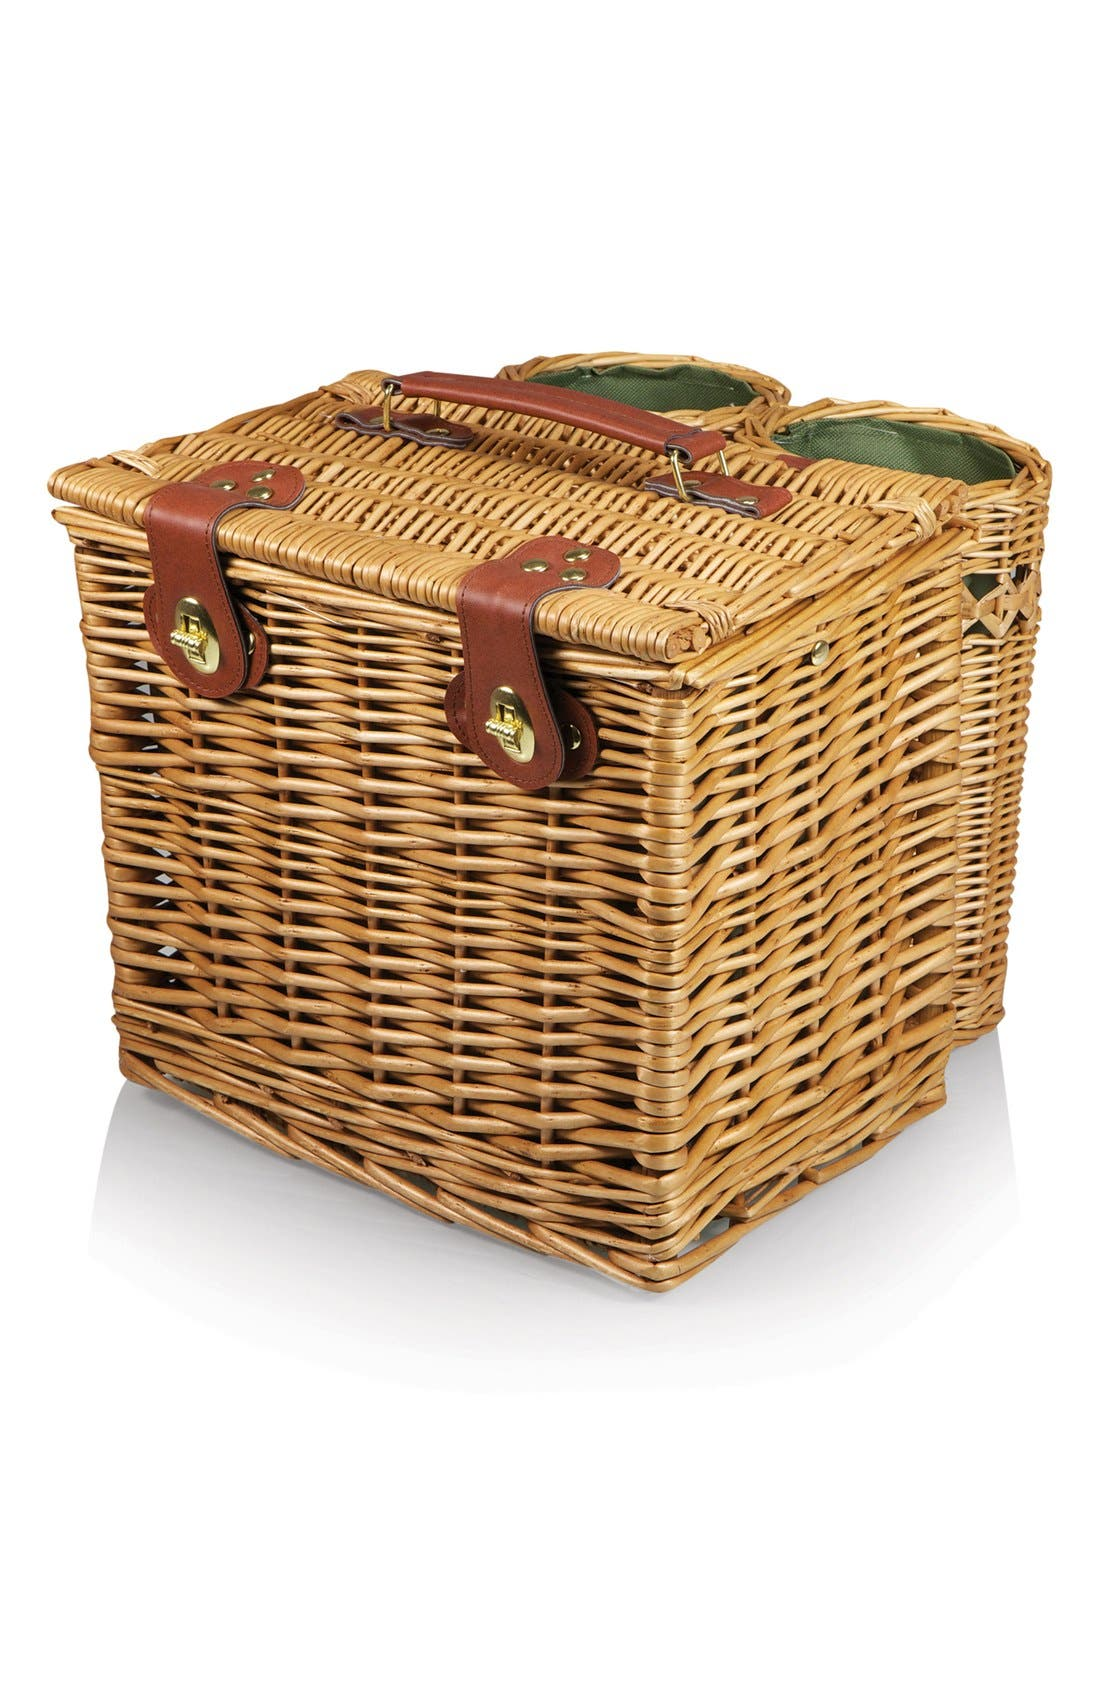 'Vino' Wine & Cheese Picnic Basket,                             Alternate thumbnail 3, color,                             300